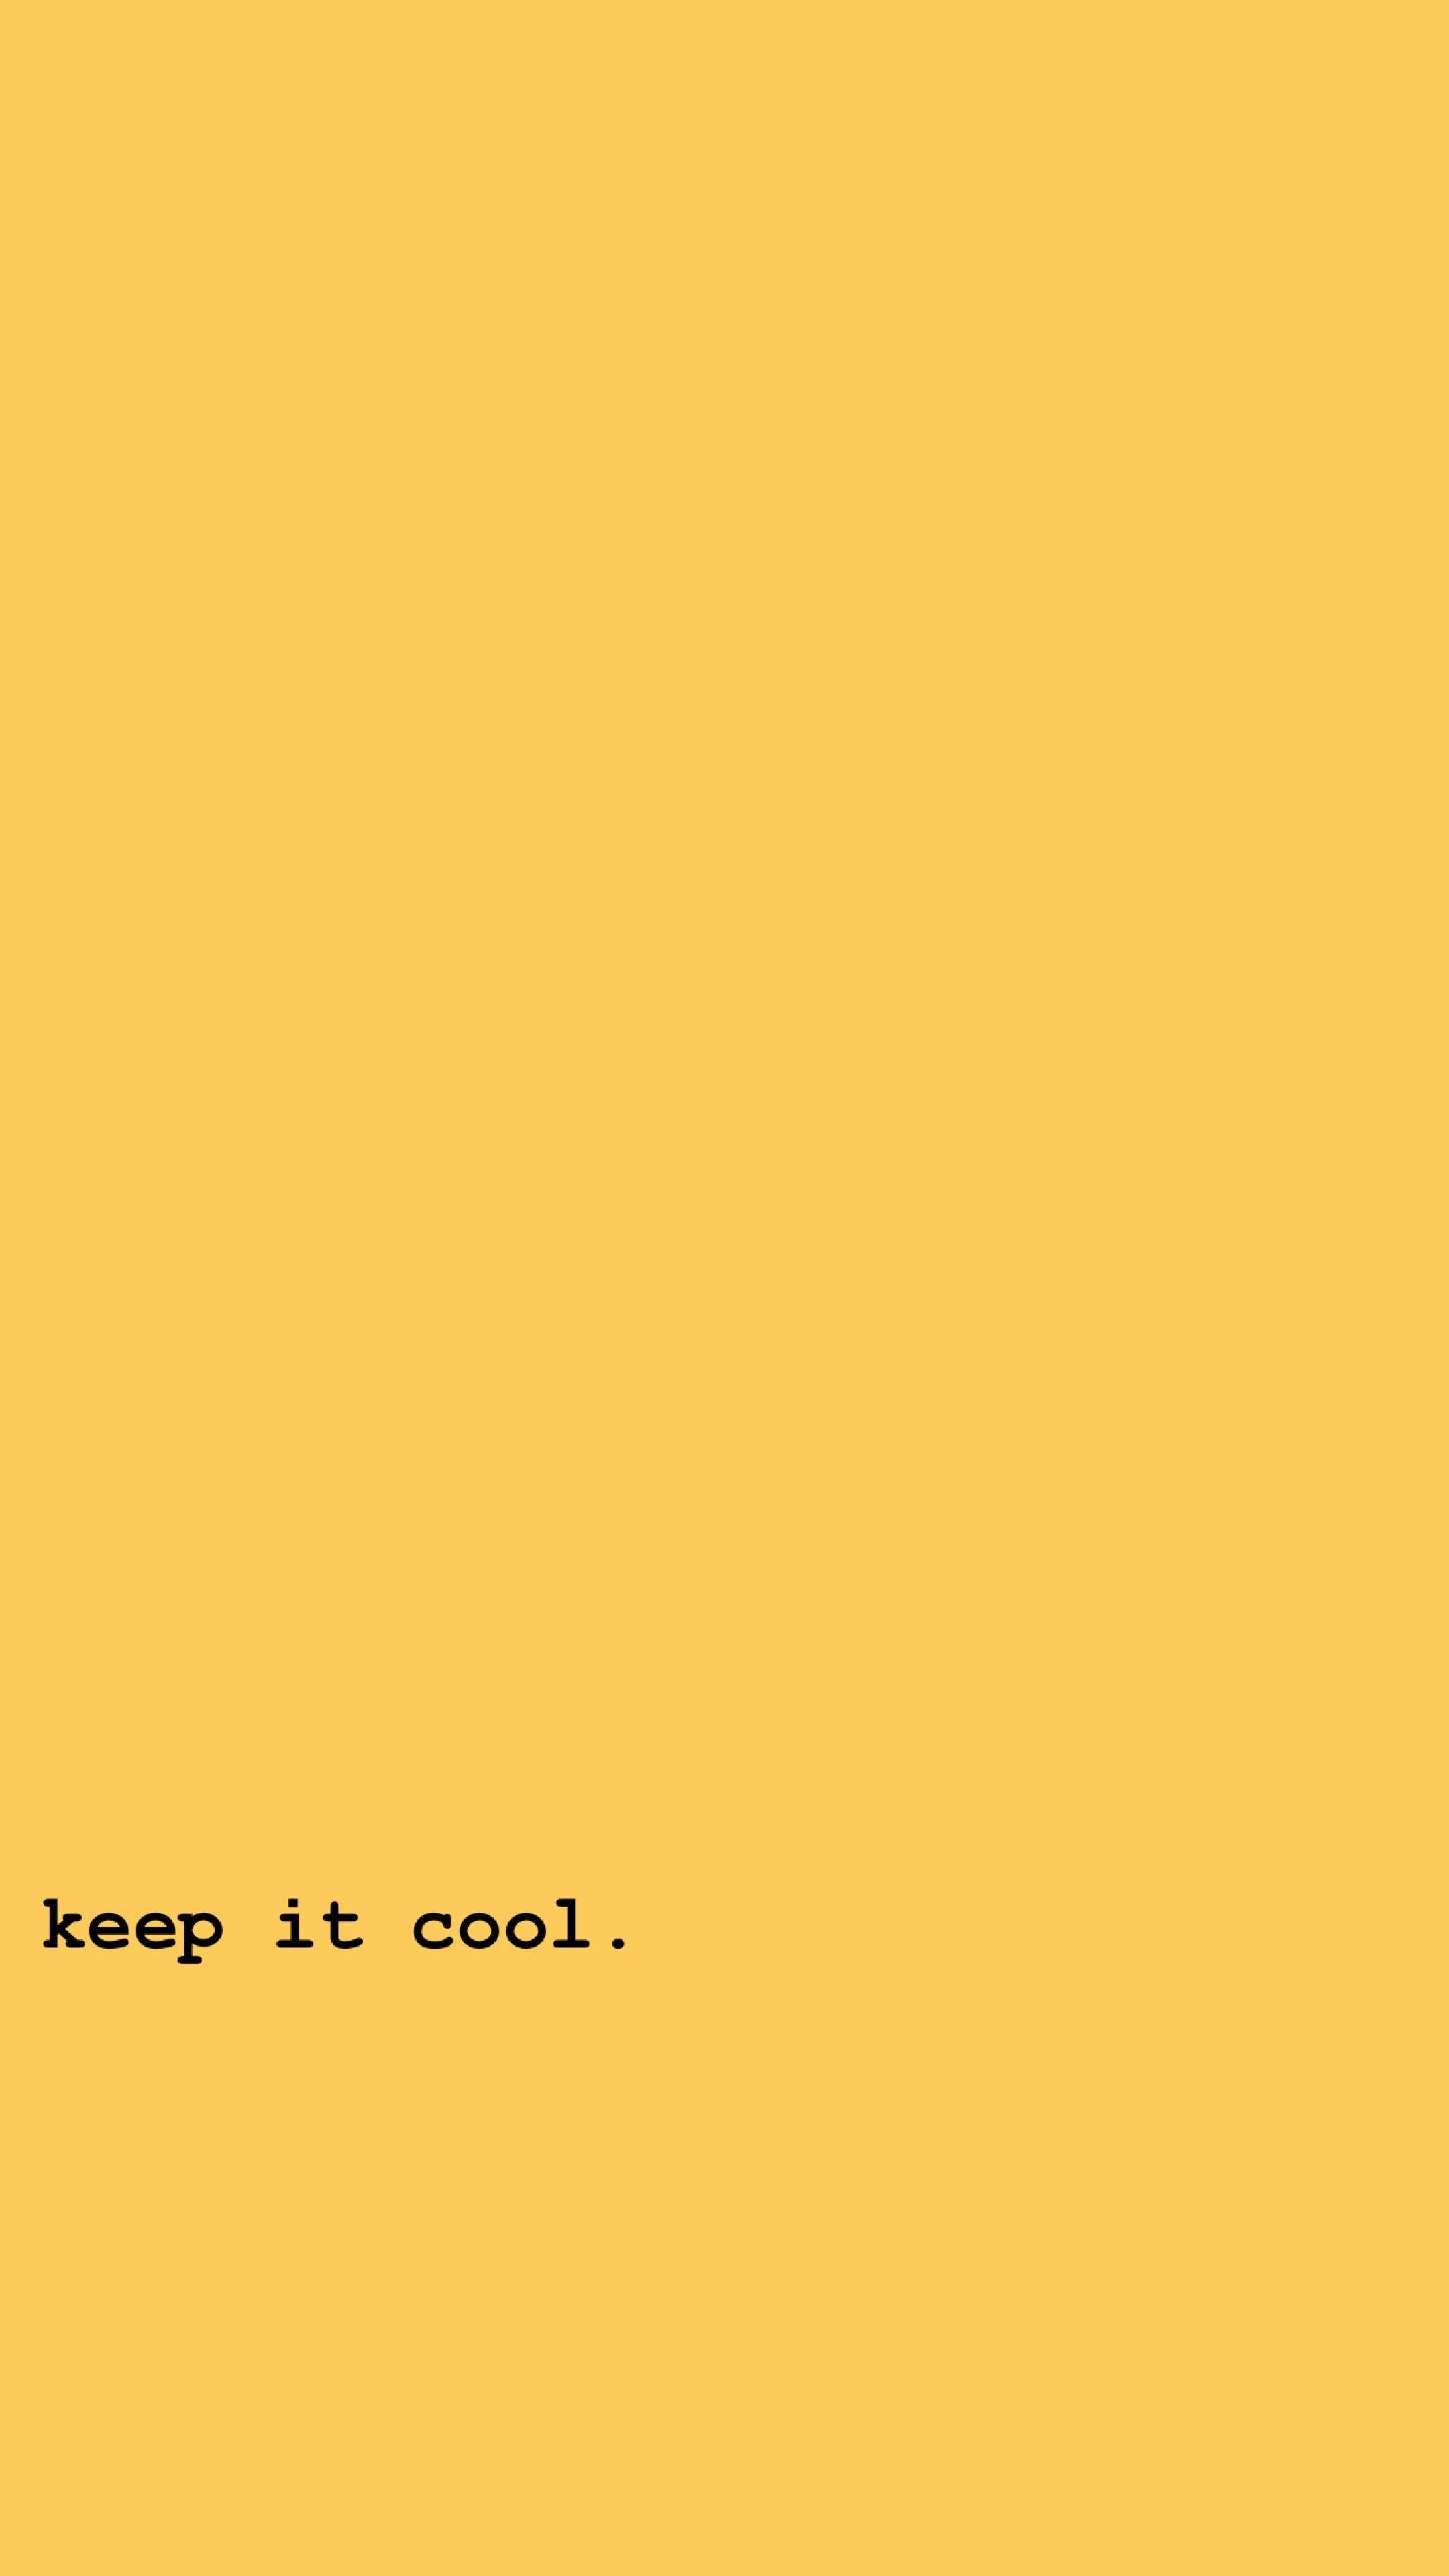 Tumblr Pastel Yellow Aesthetic Wallpaper